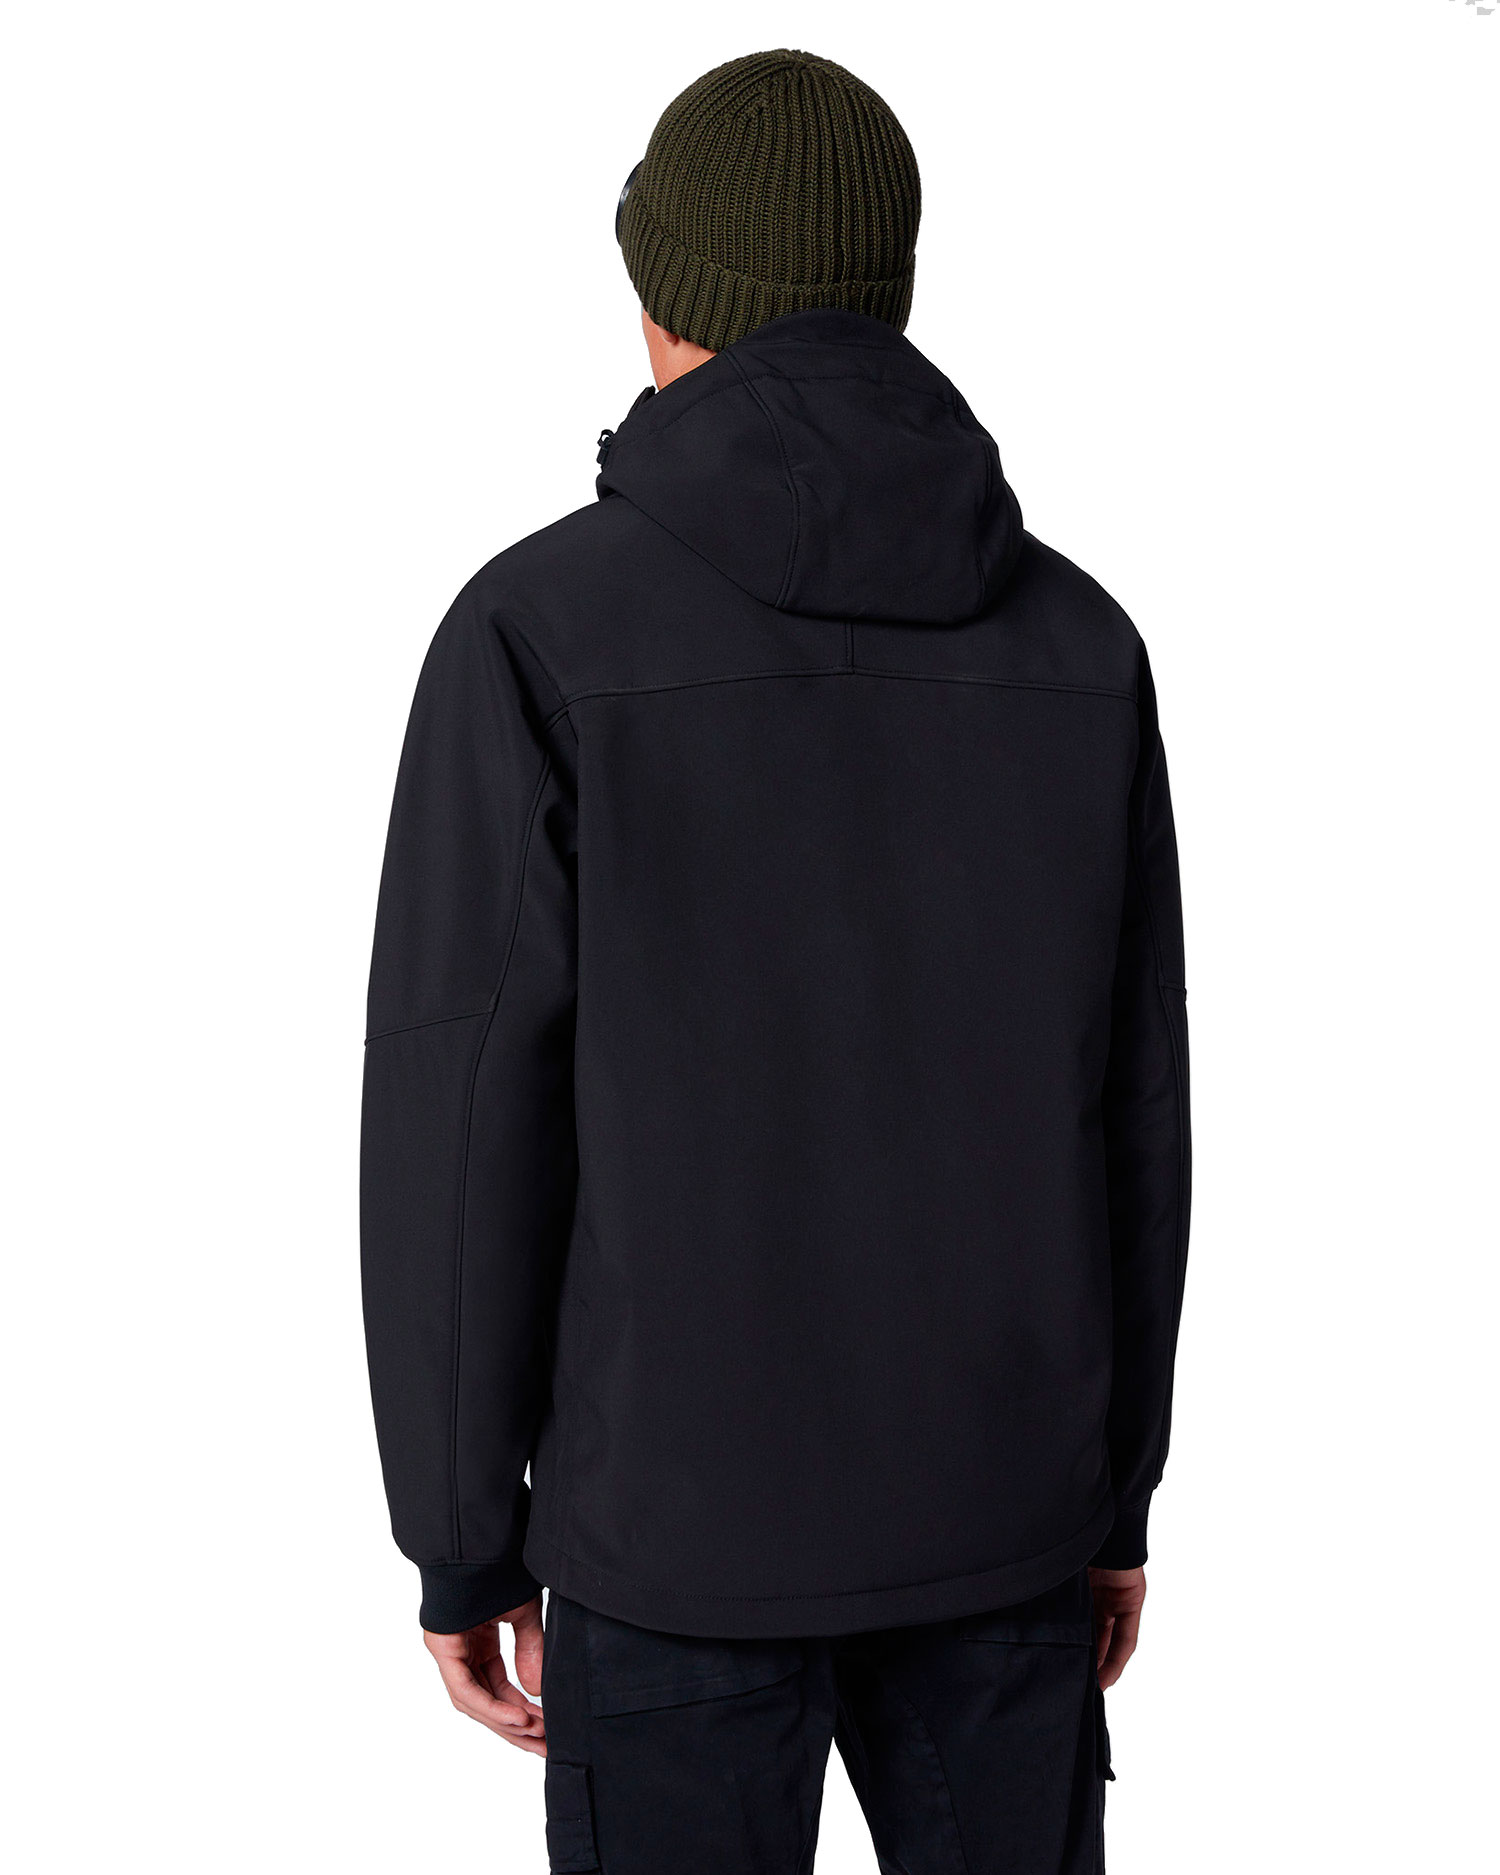 Jacket C.P. Shell Urban Protection black C.P. COMPANY | Jackets | 09CMOW043A005784A999